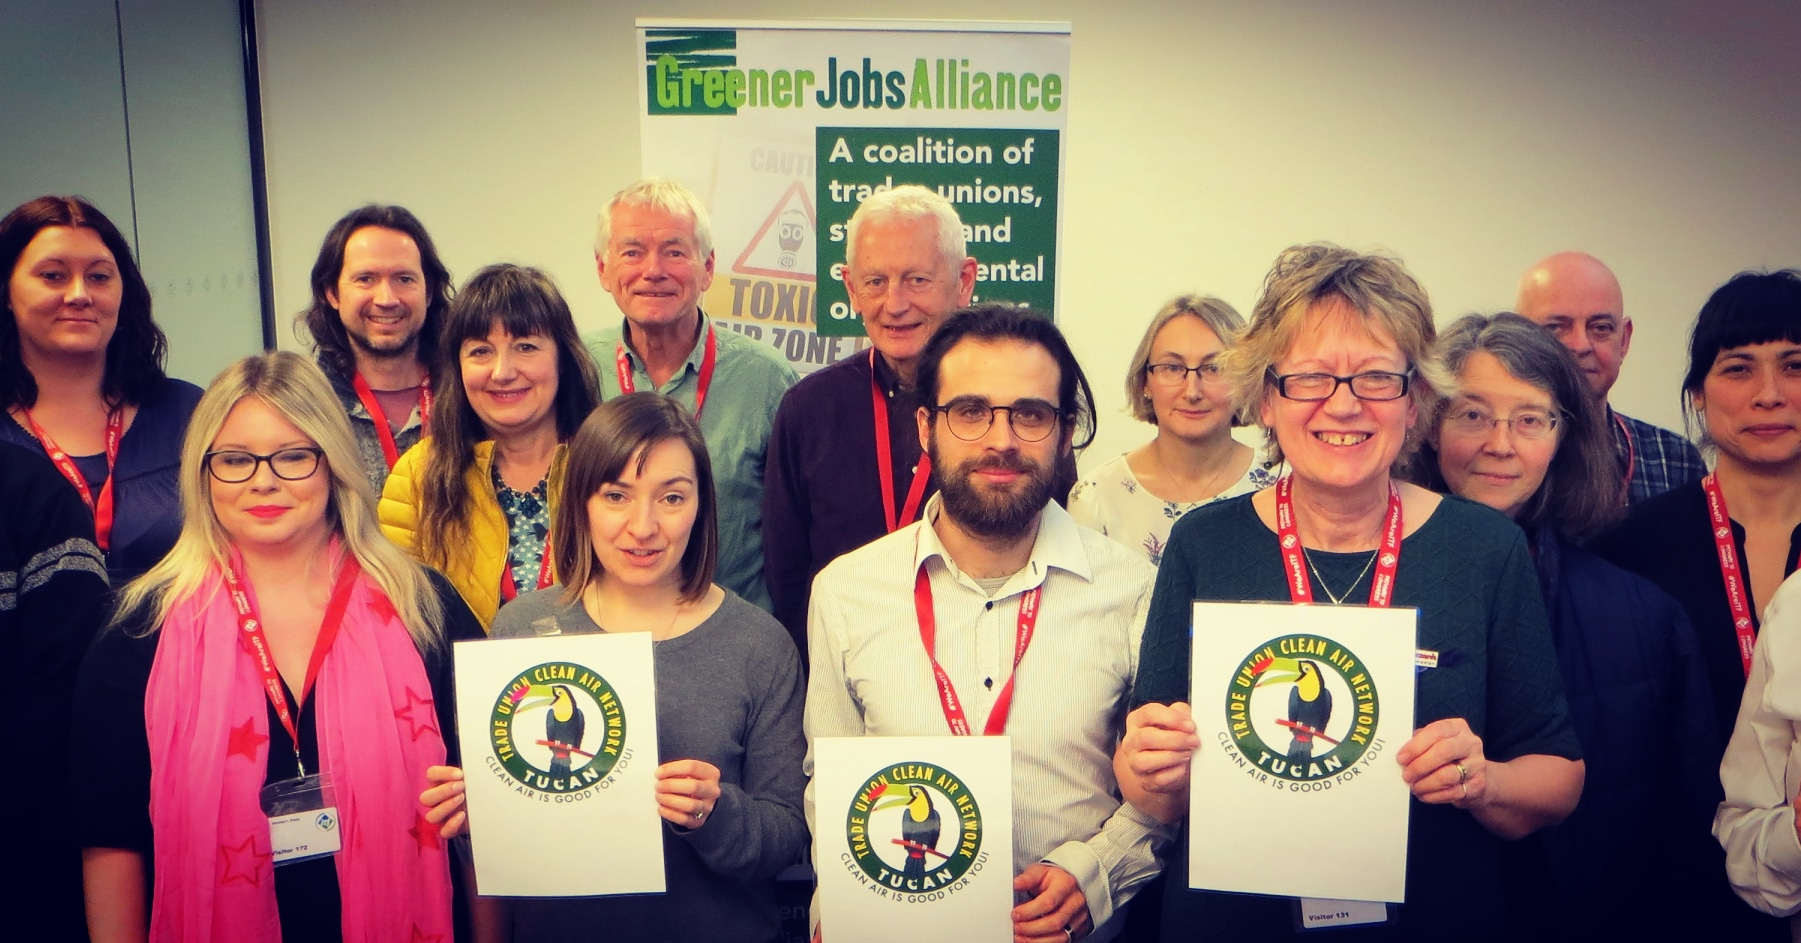 Greener Jobs Alliance launch (http://www.greenerjobsalliance.co.uk/)